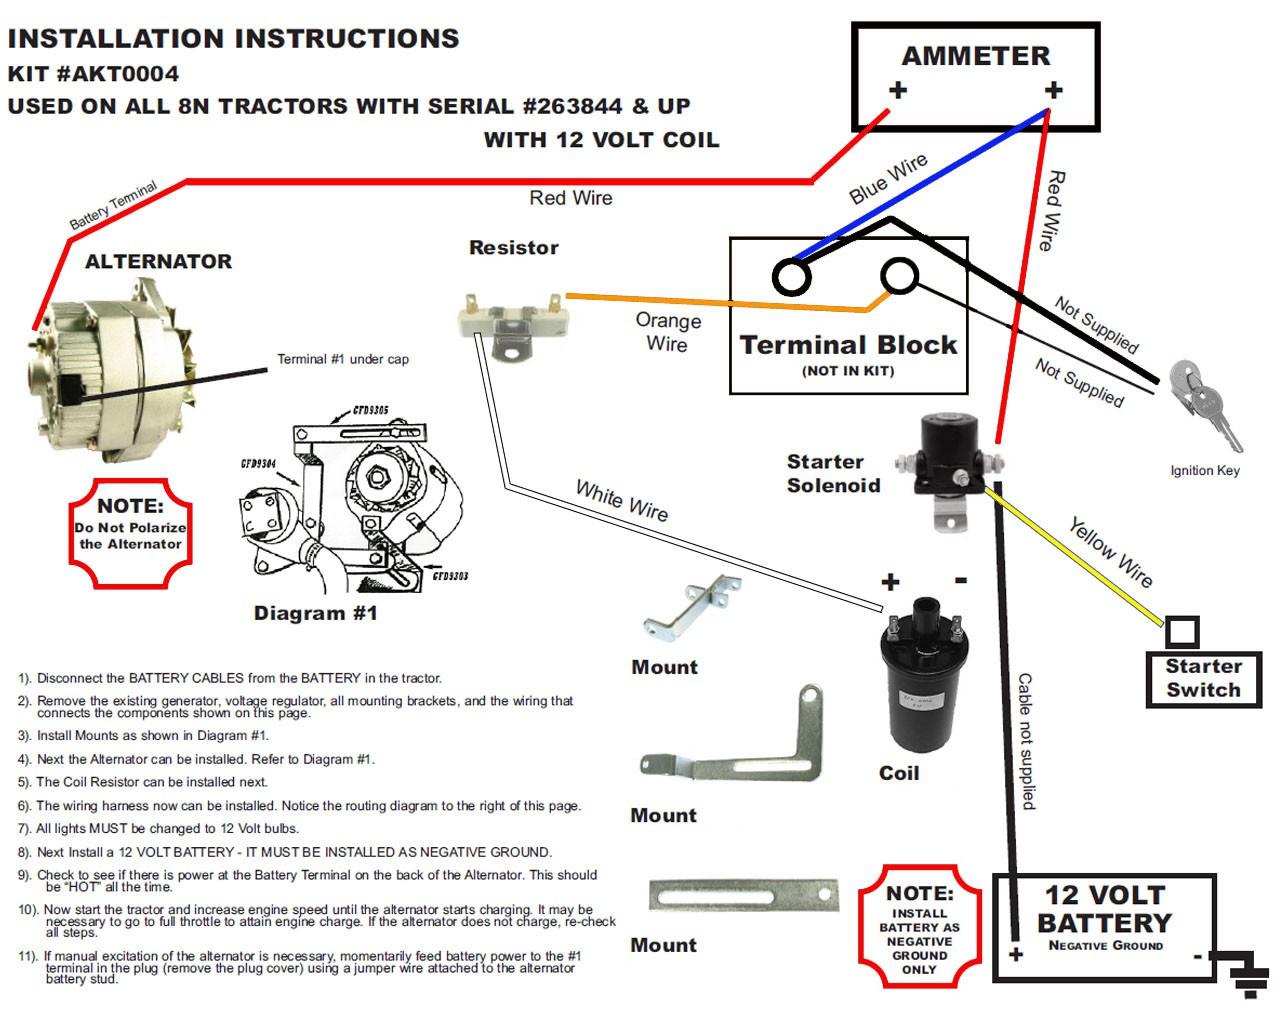 [SCHEMATICS_4PO]  NEW 8N FORD ALTERNATOR FITS GENERATOR CONVERSION KIT SIDE MOUNT SN  263844-UP | eBay | Ford Naa Generator Wiring Diagram |  | eBay